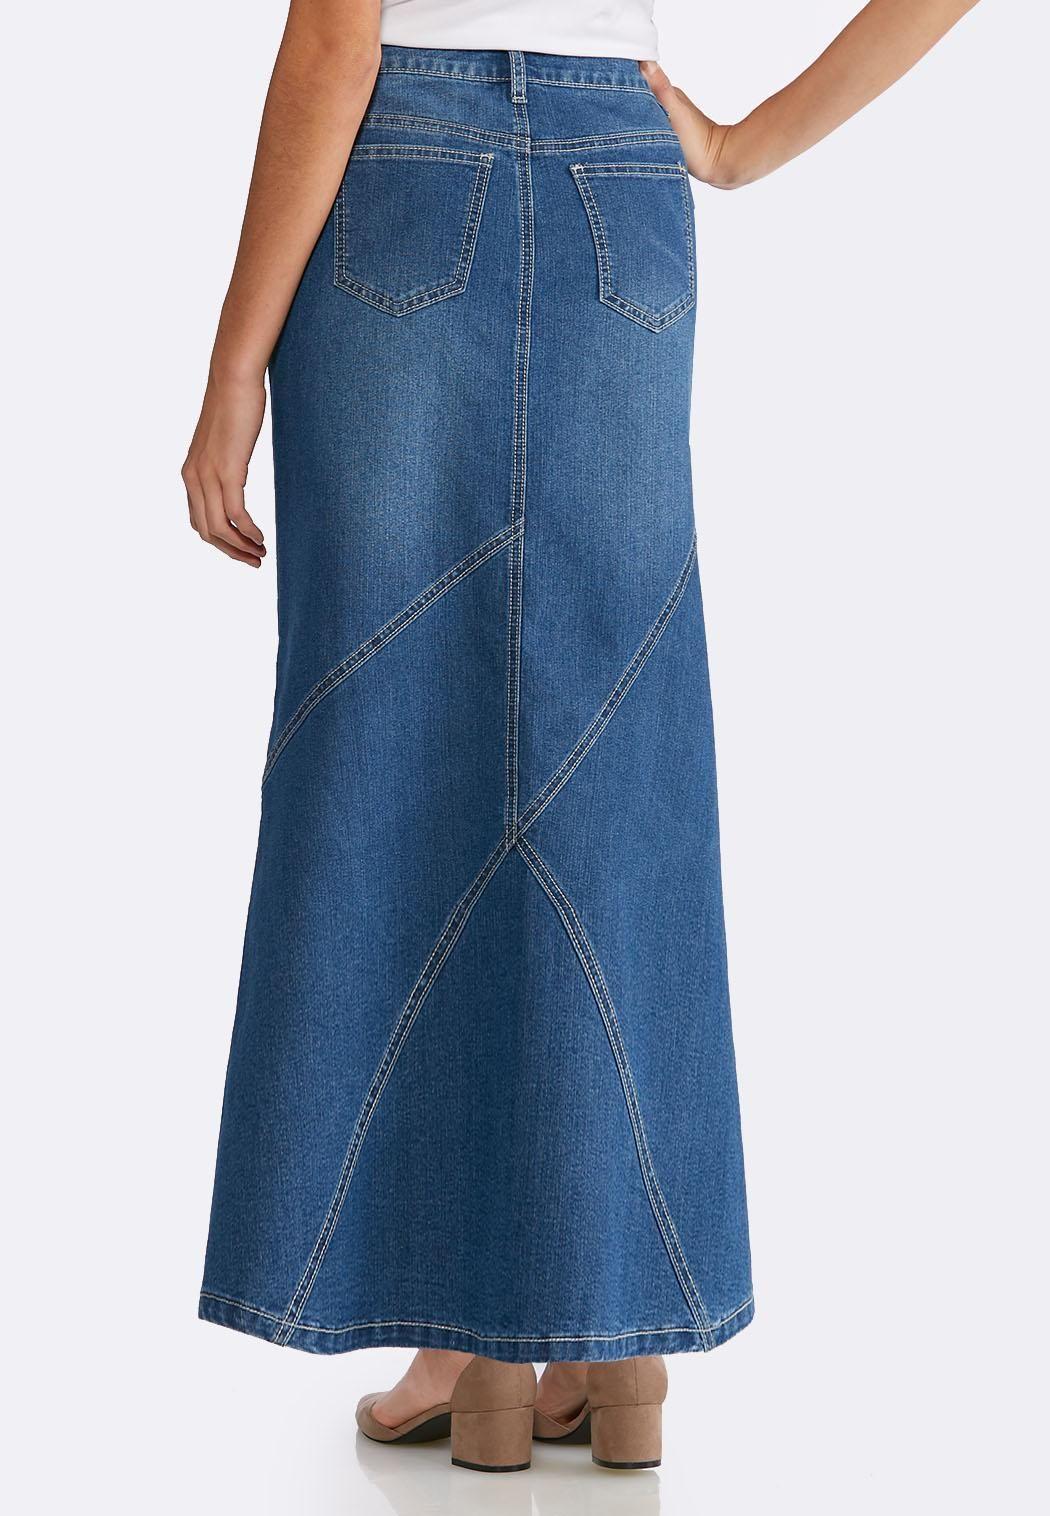 2a1bf1e69 Denim Multi Seam Maxi Skirt Skirts Cato Fashions | Sewing: Skirts ...